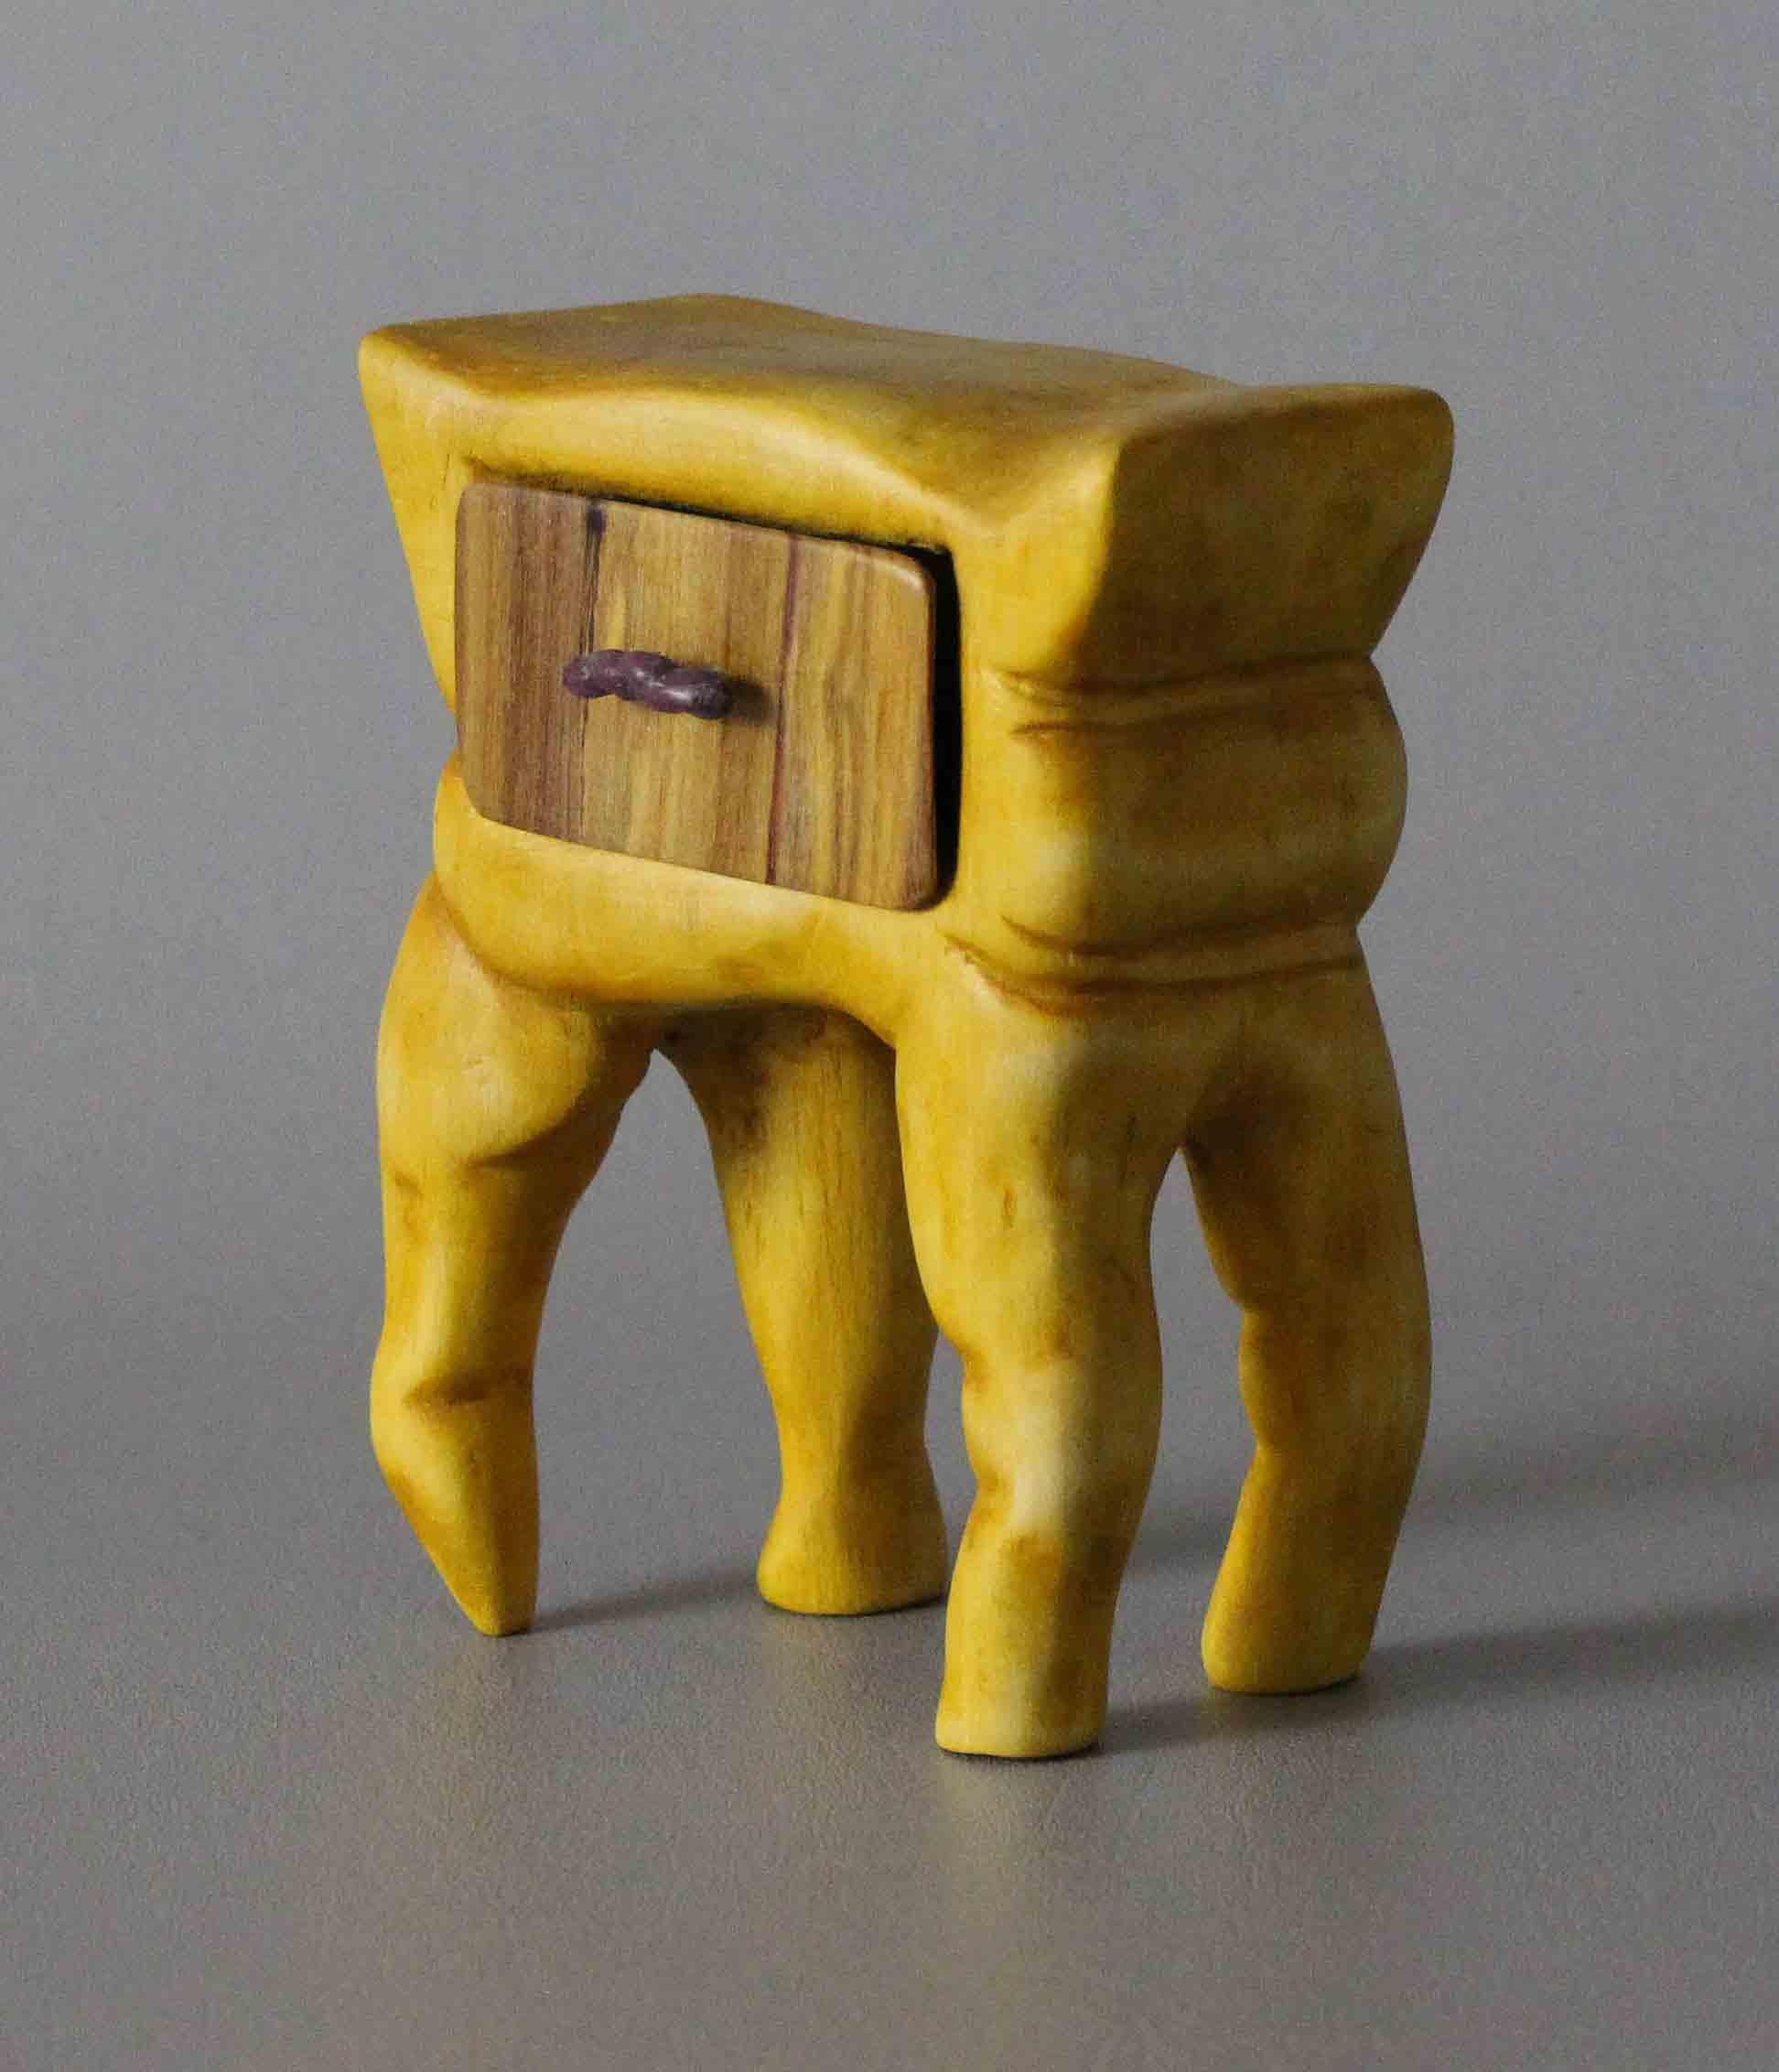 Grant Woodruff's wood carving titled Beyond Creep.